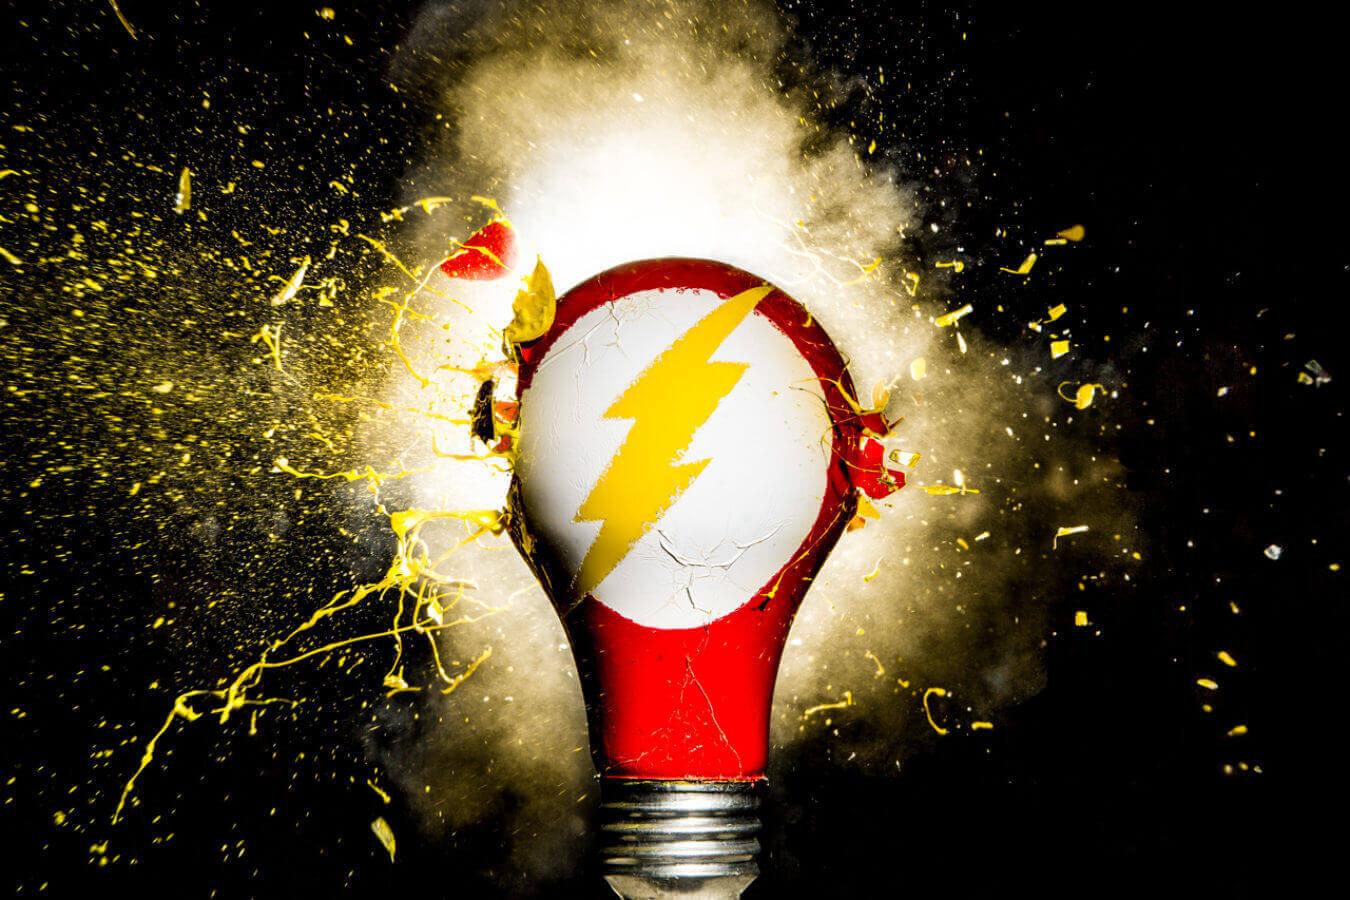 Флэш - Супергерои из лампочек